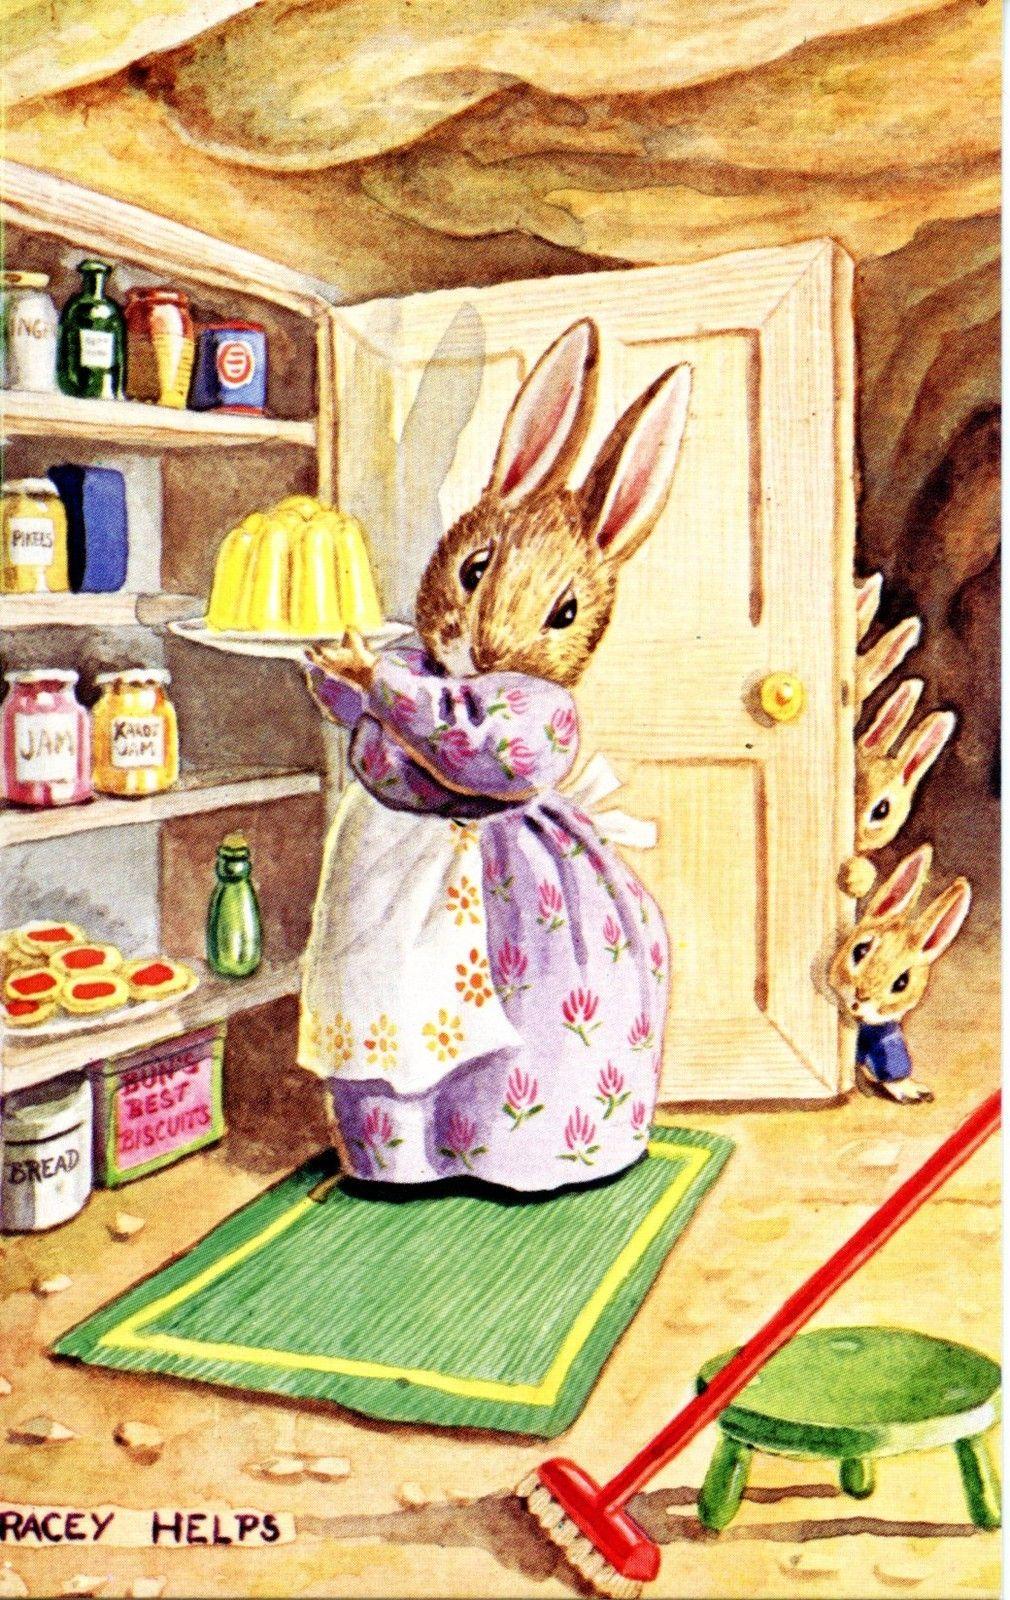 Miss Bun\'s Pantry by Racey Helps | sweet | Pinterest | Larder, Susan ...